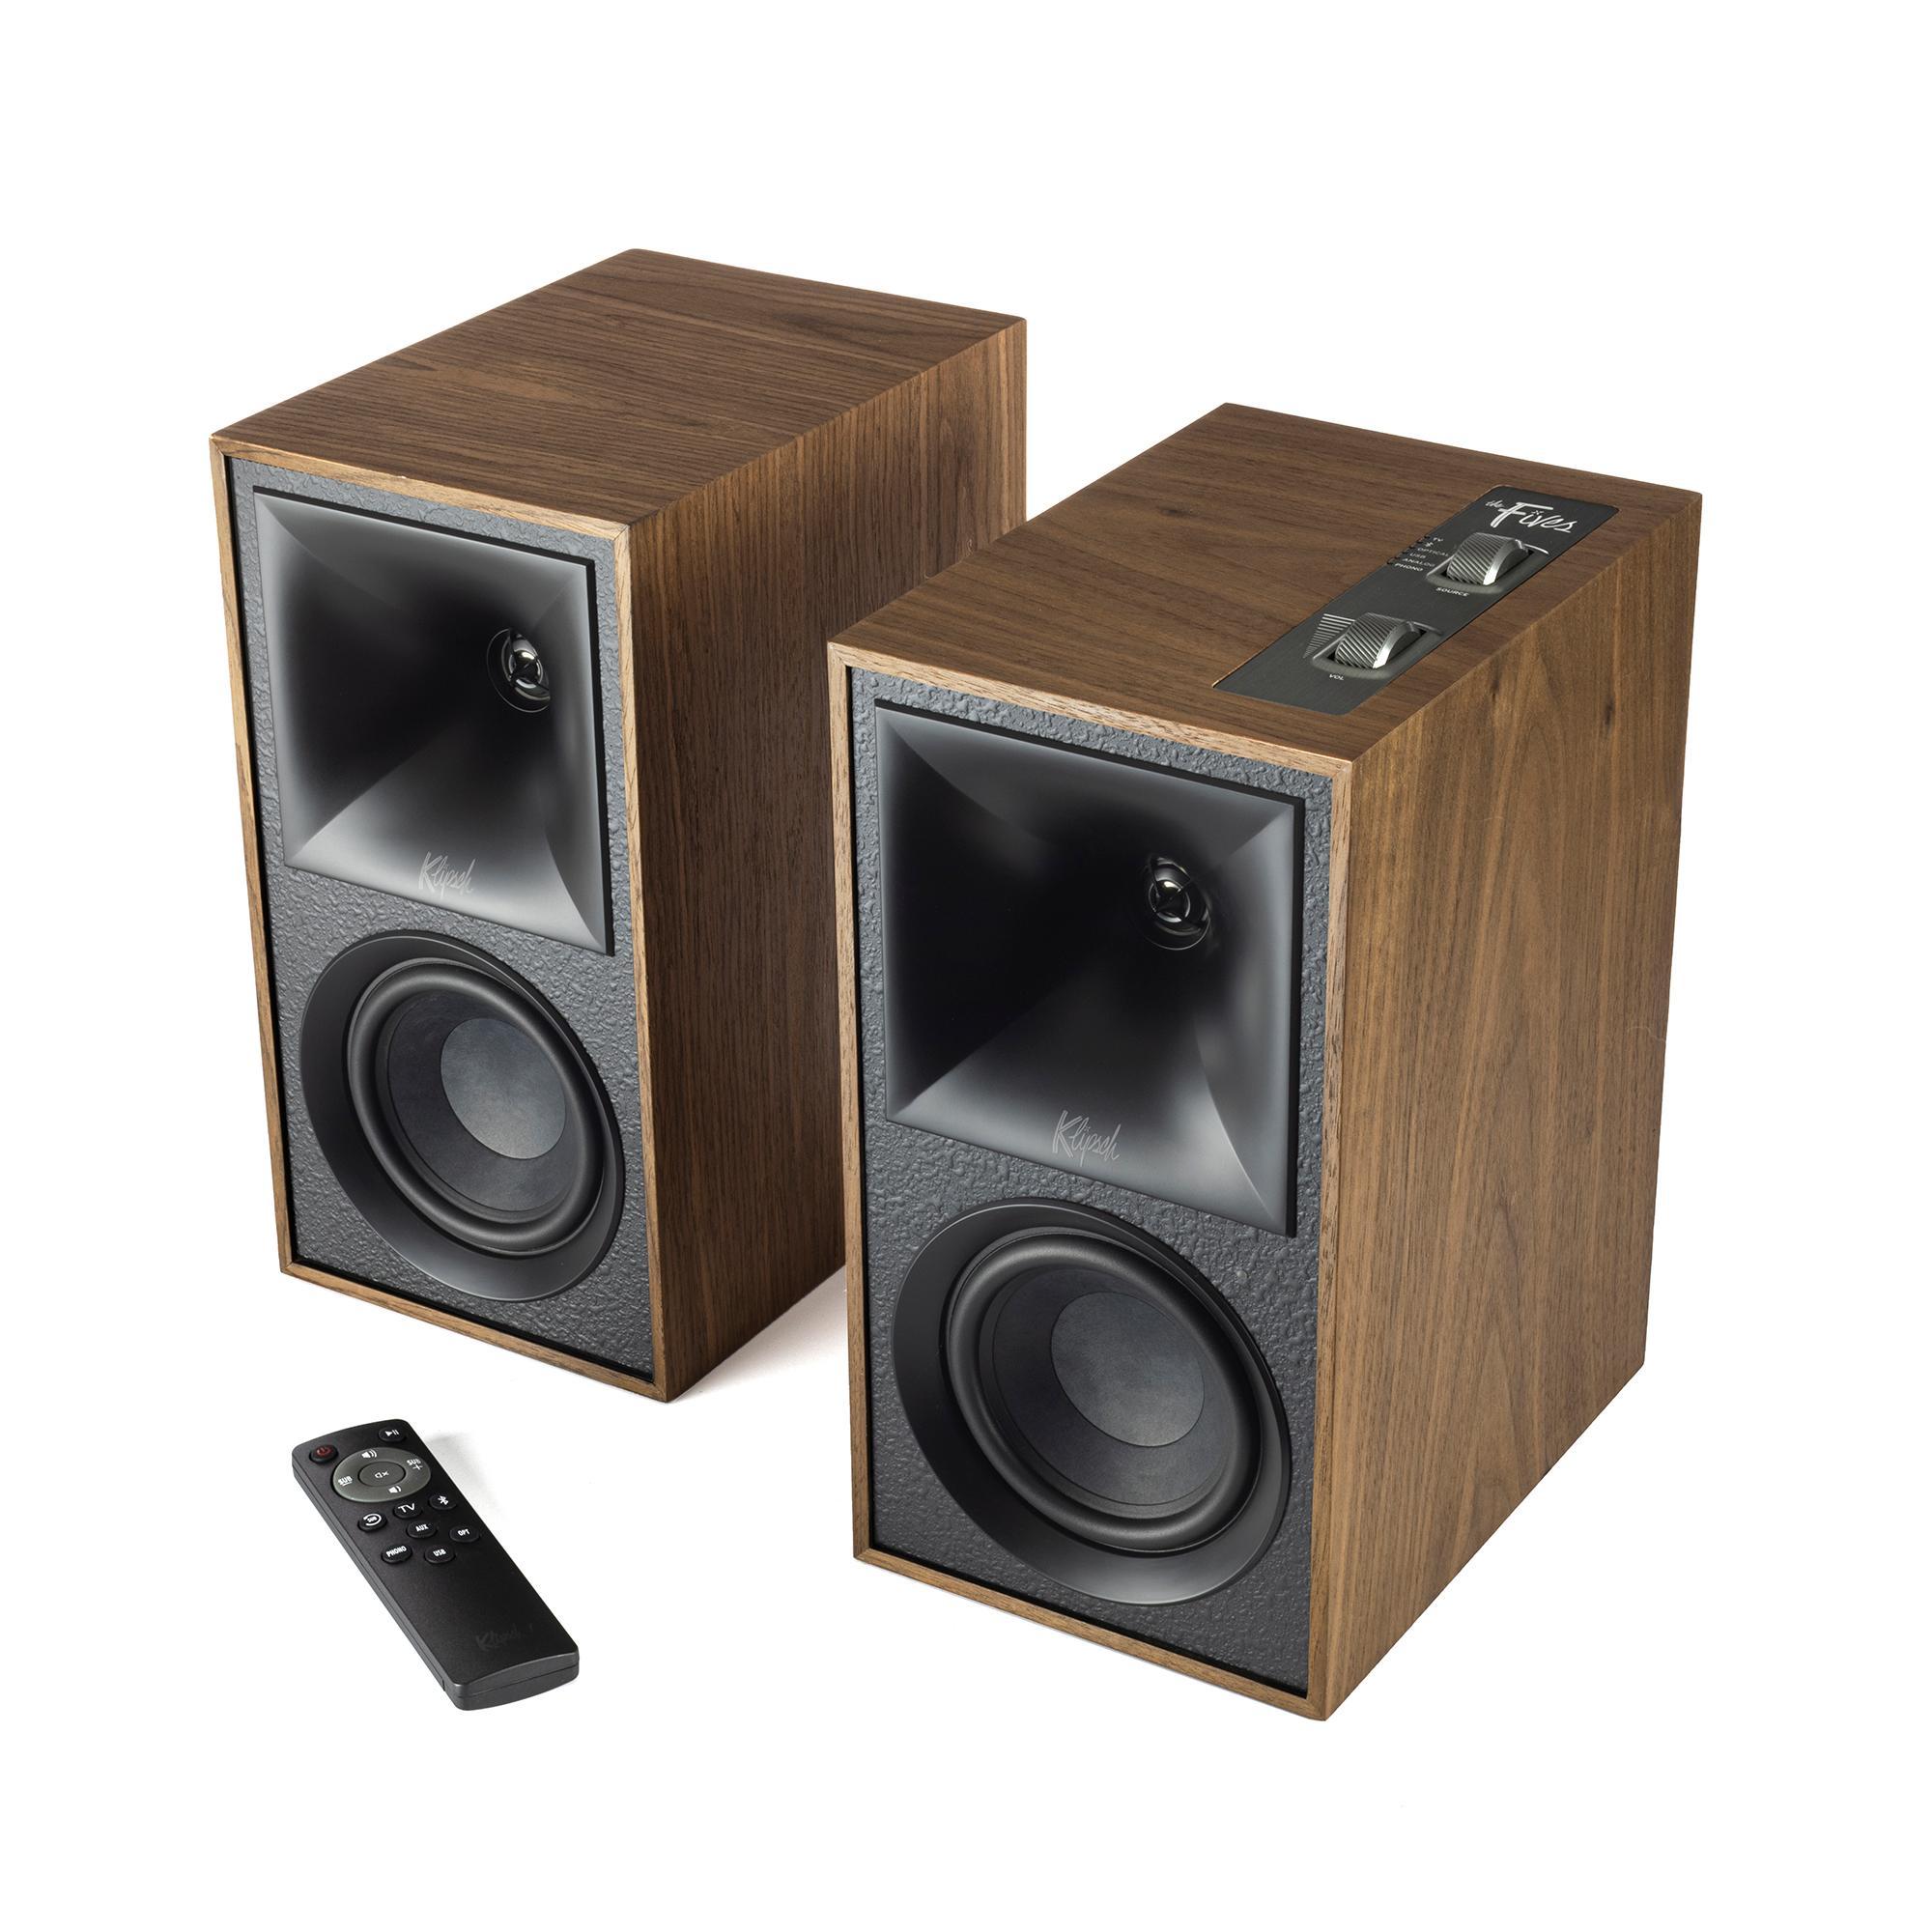 The Fives Powered Speakers Powered Speakers - Walnut